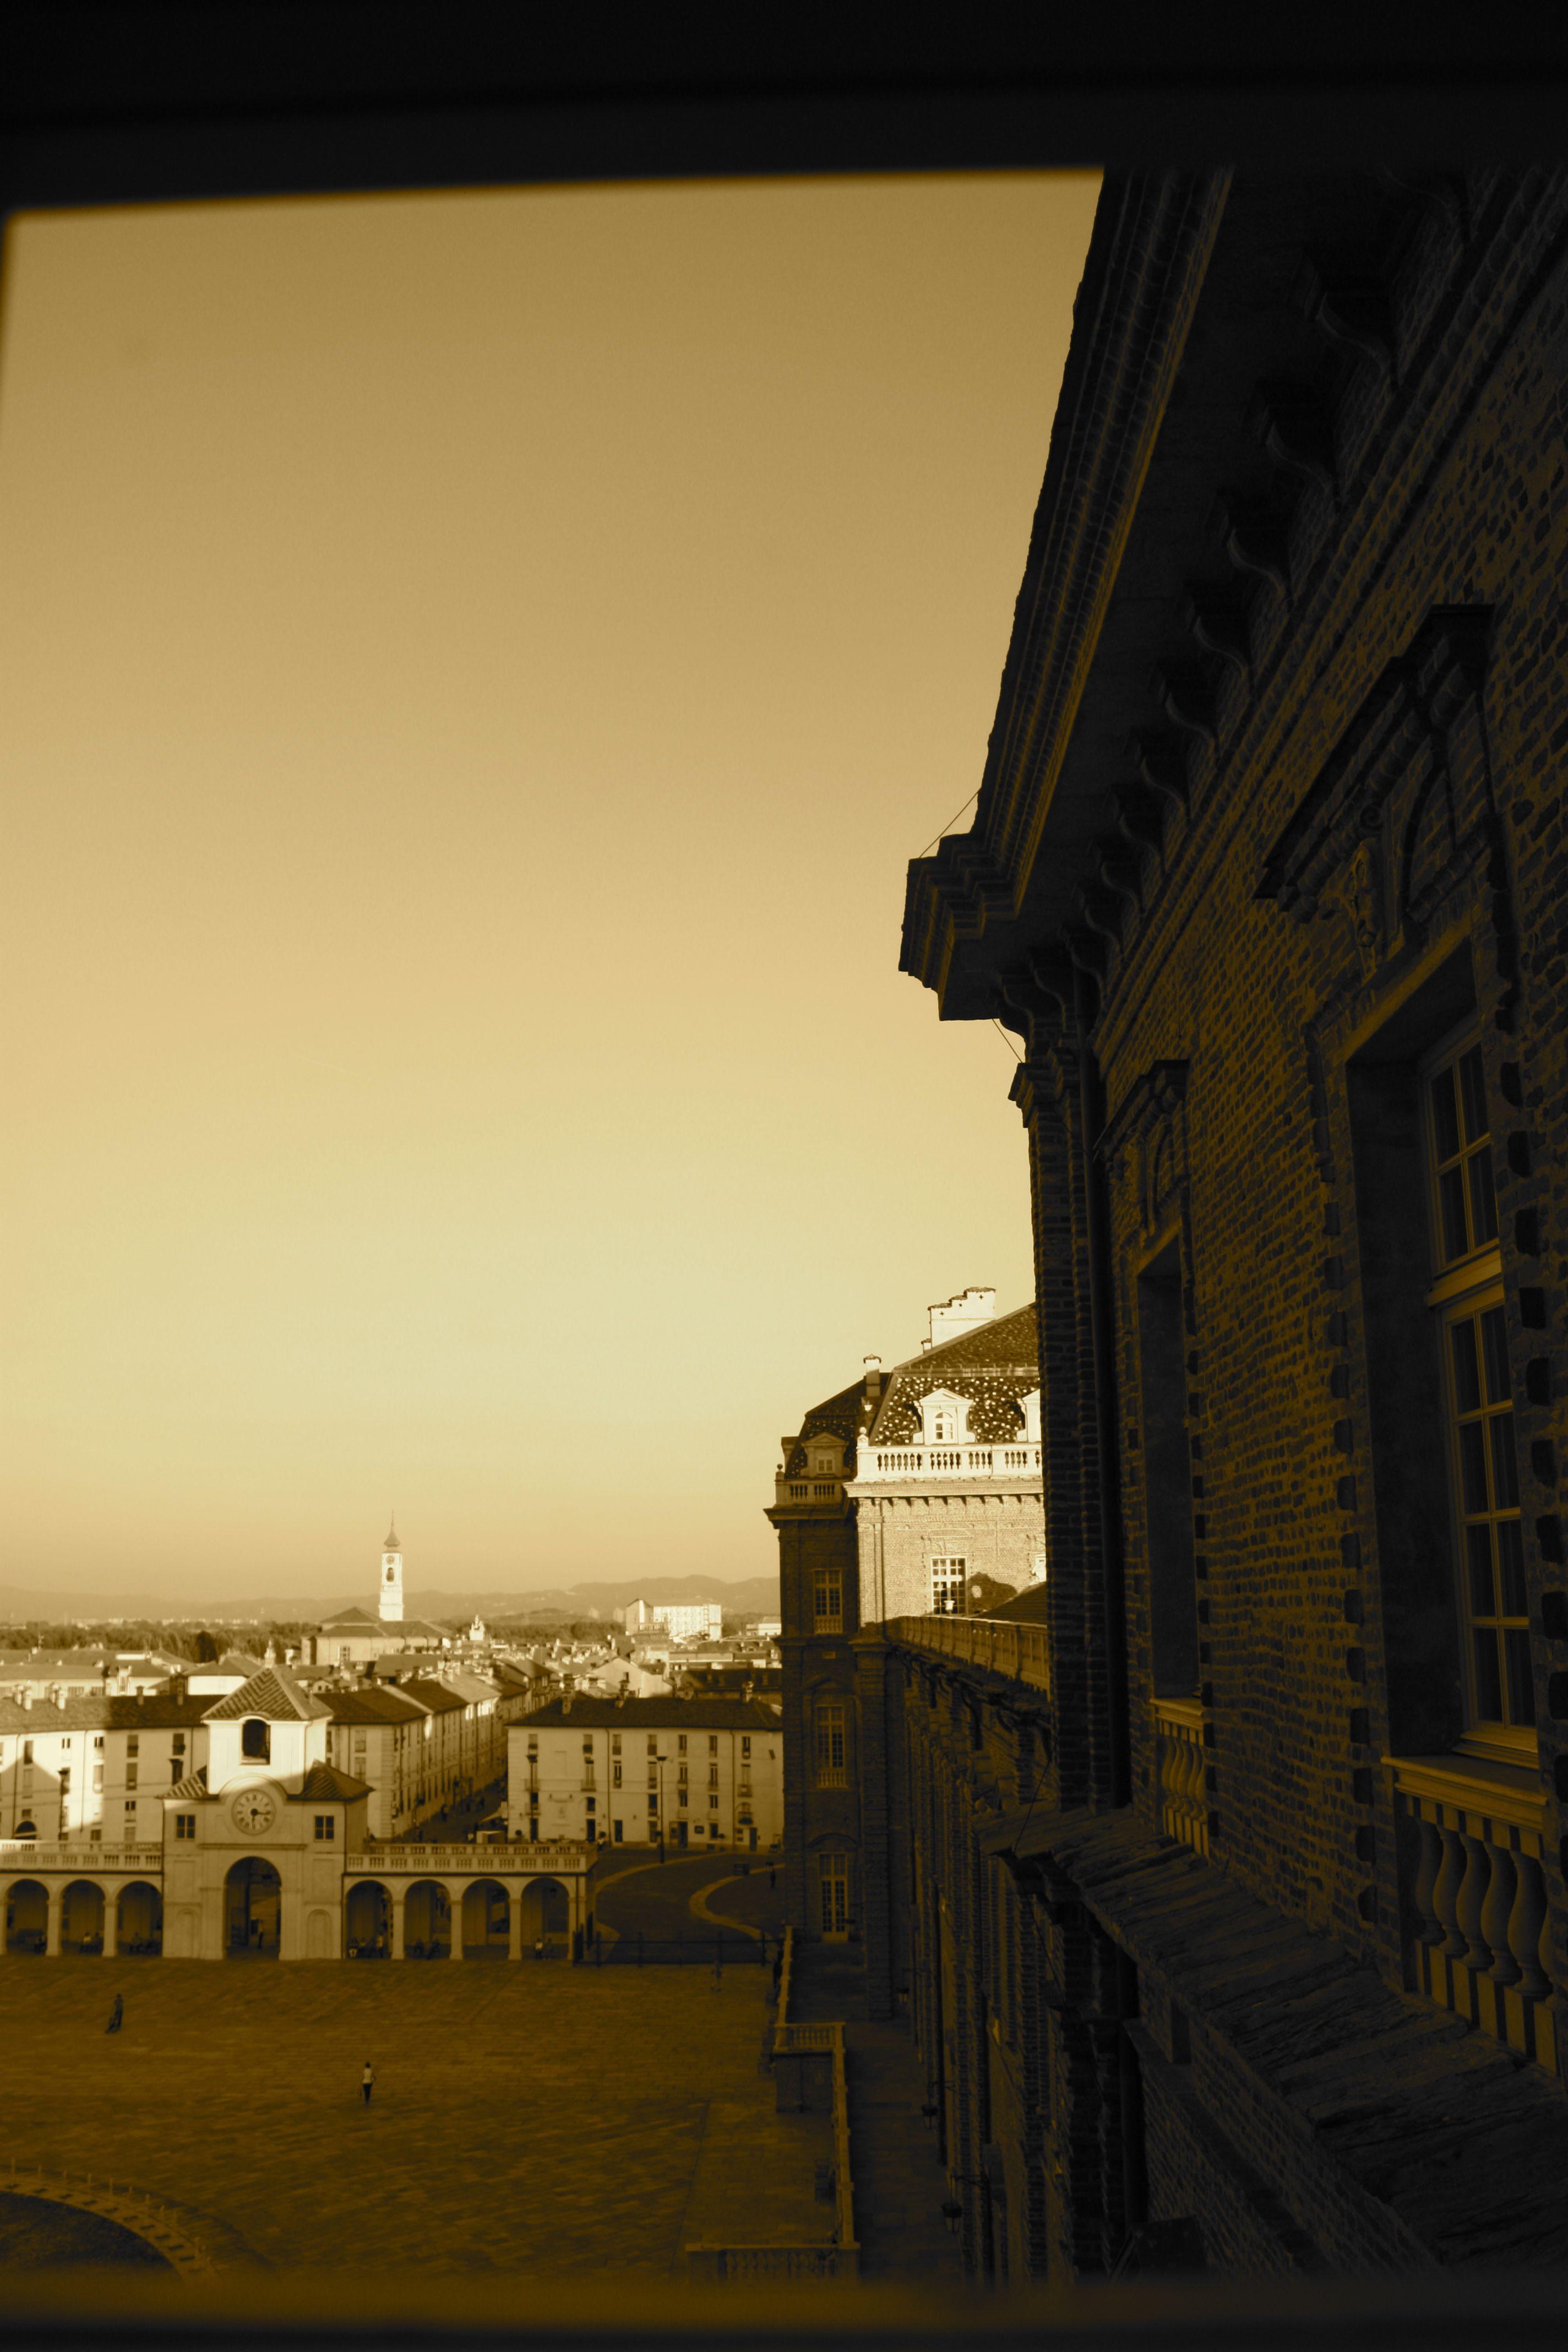 Venaria (Turin)